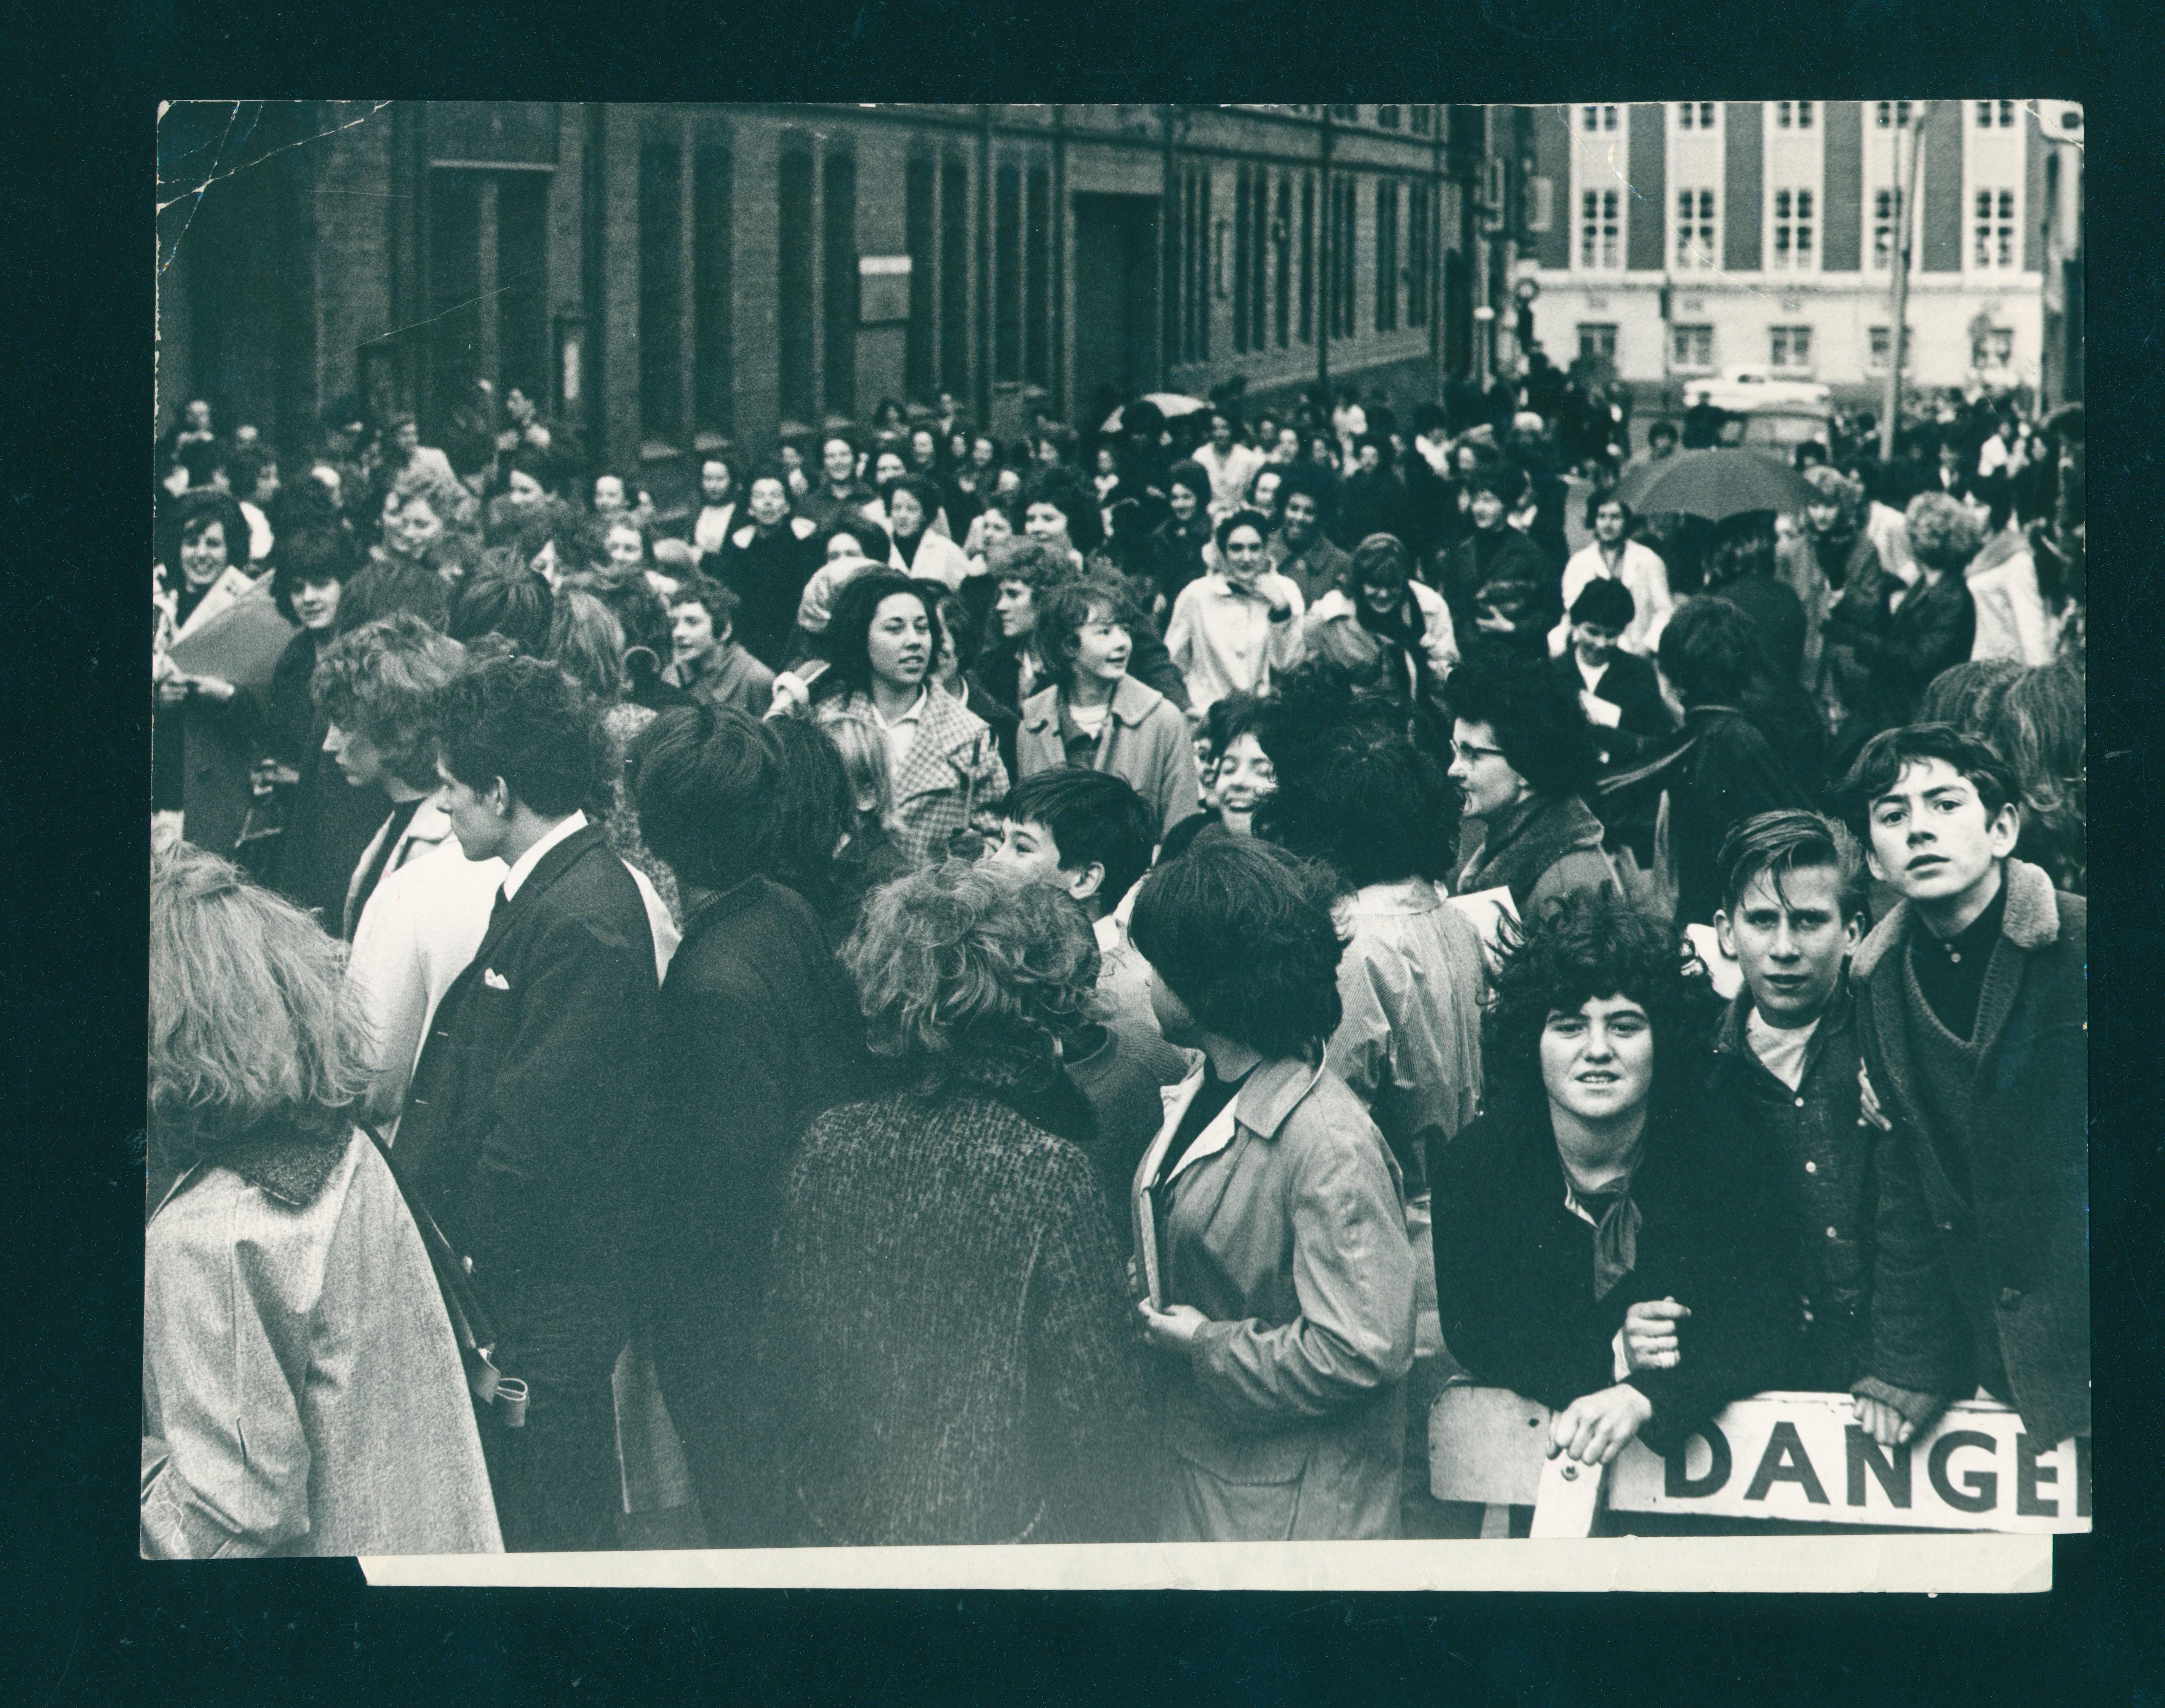 Waiting to see The Beatles, November 1963